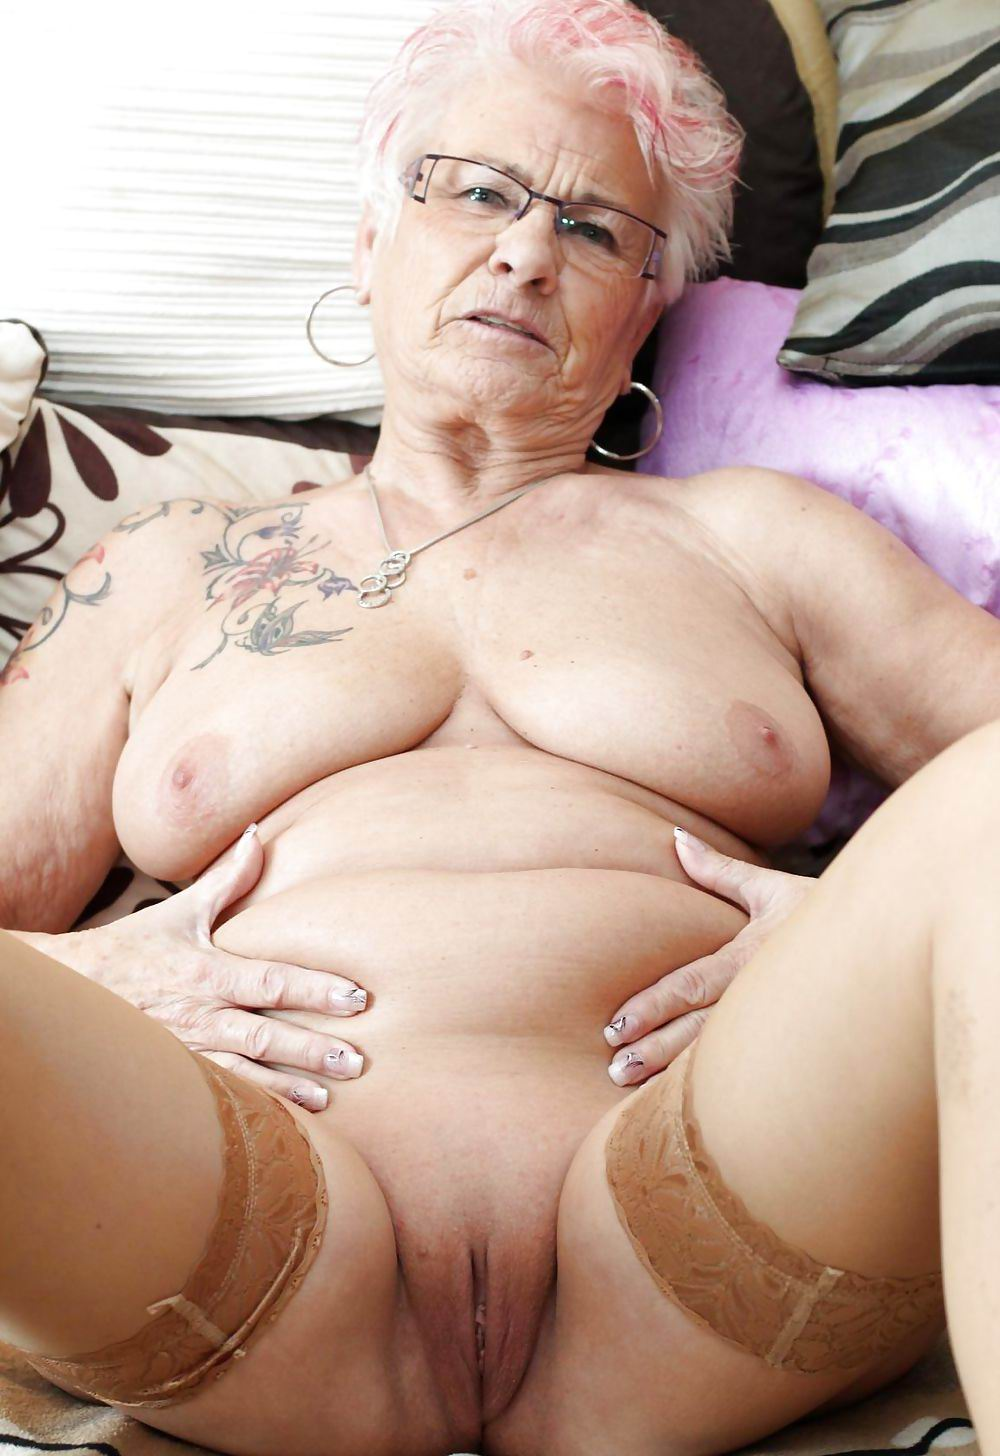 femme nu qui fait pipi gothique salope